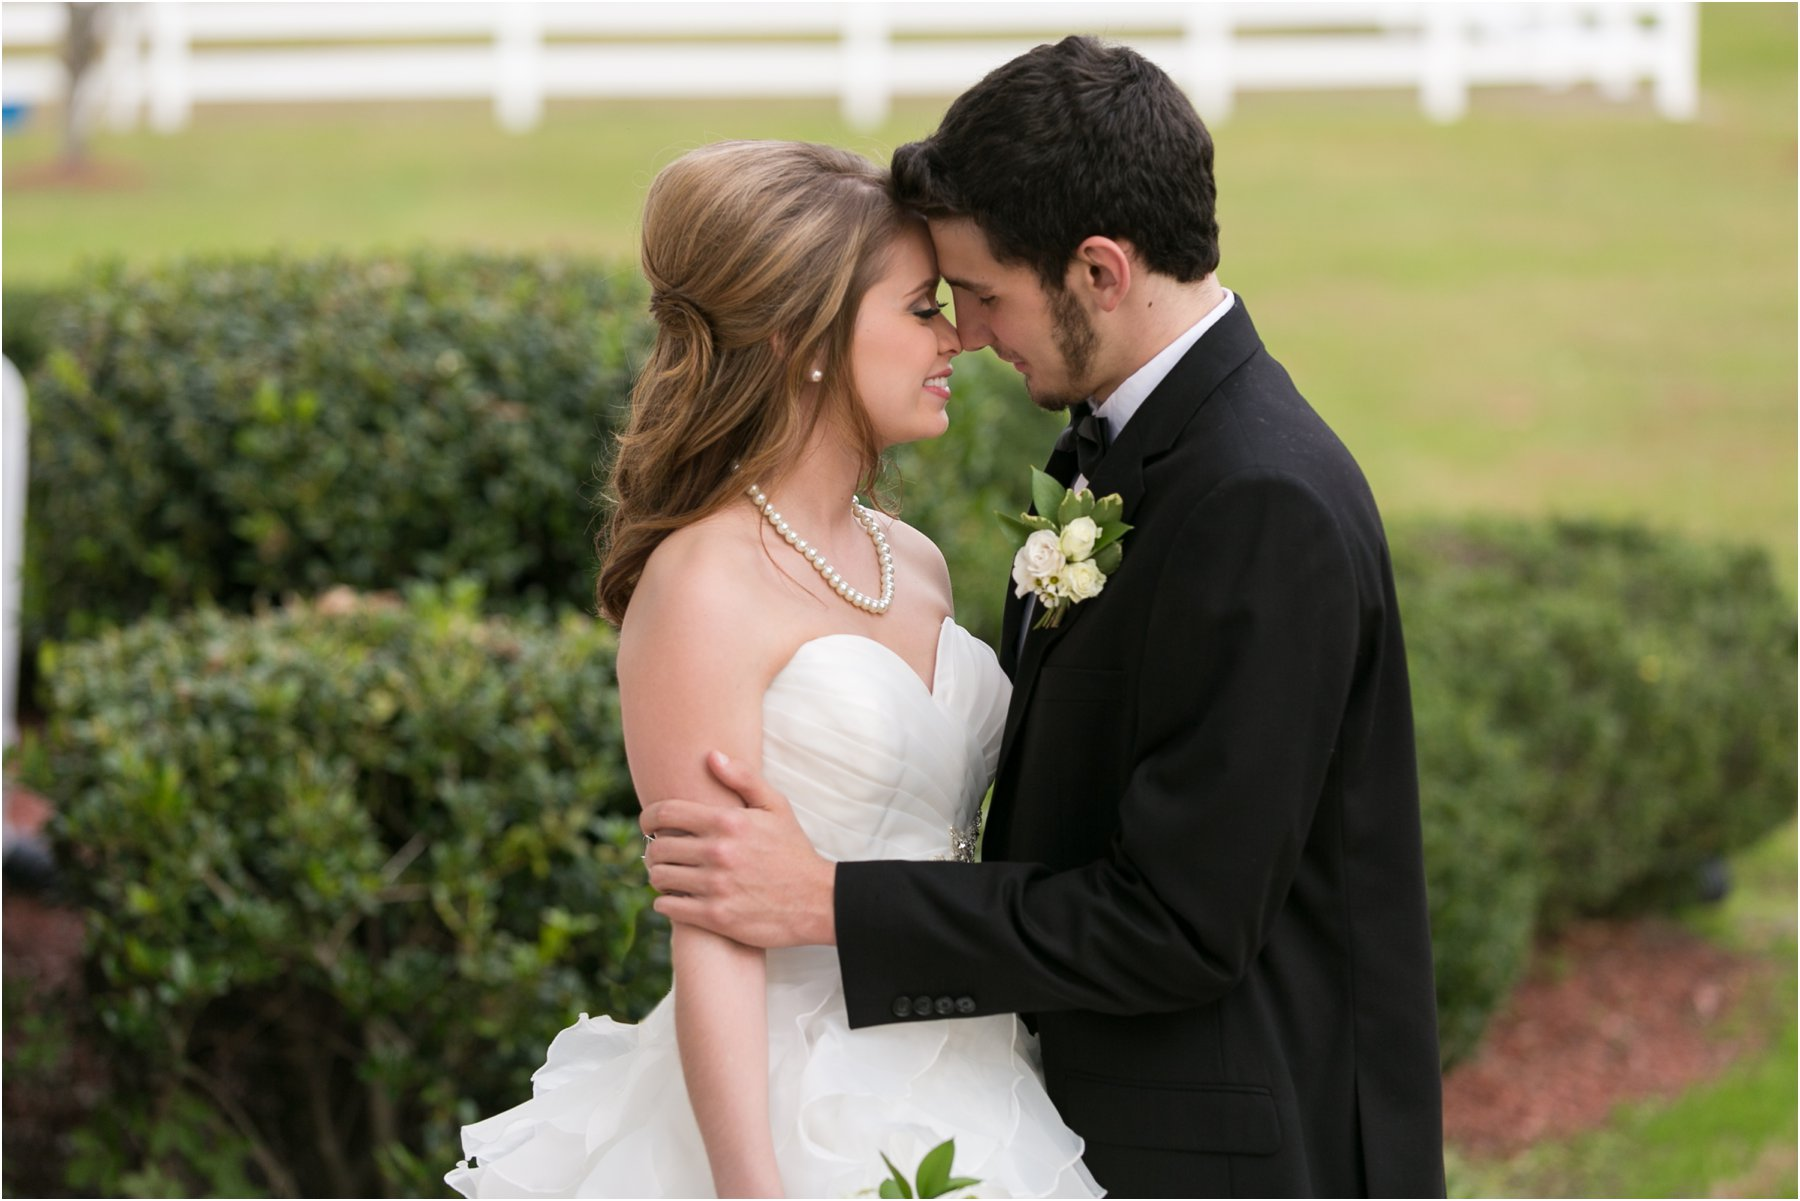 Holly_Ridge_Manor_Wedding_Photography_Jessica_Ryan_Photography_virginia_virginia_beach_0258